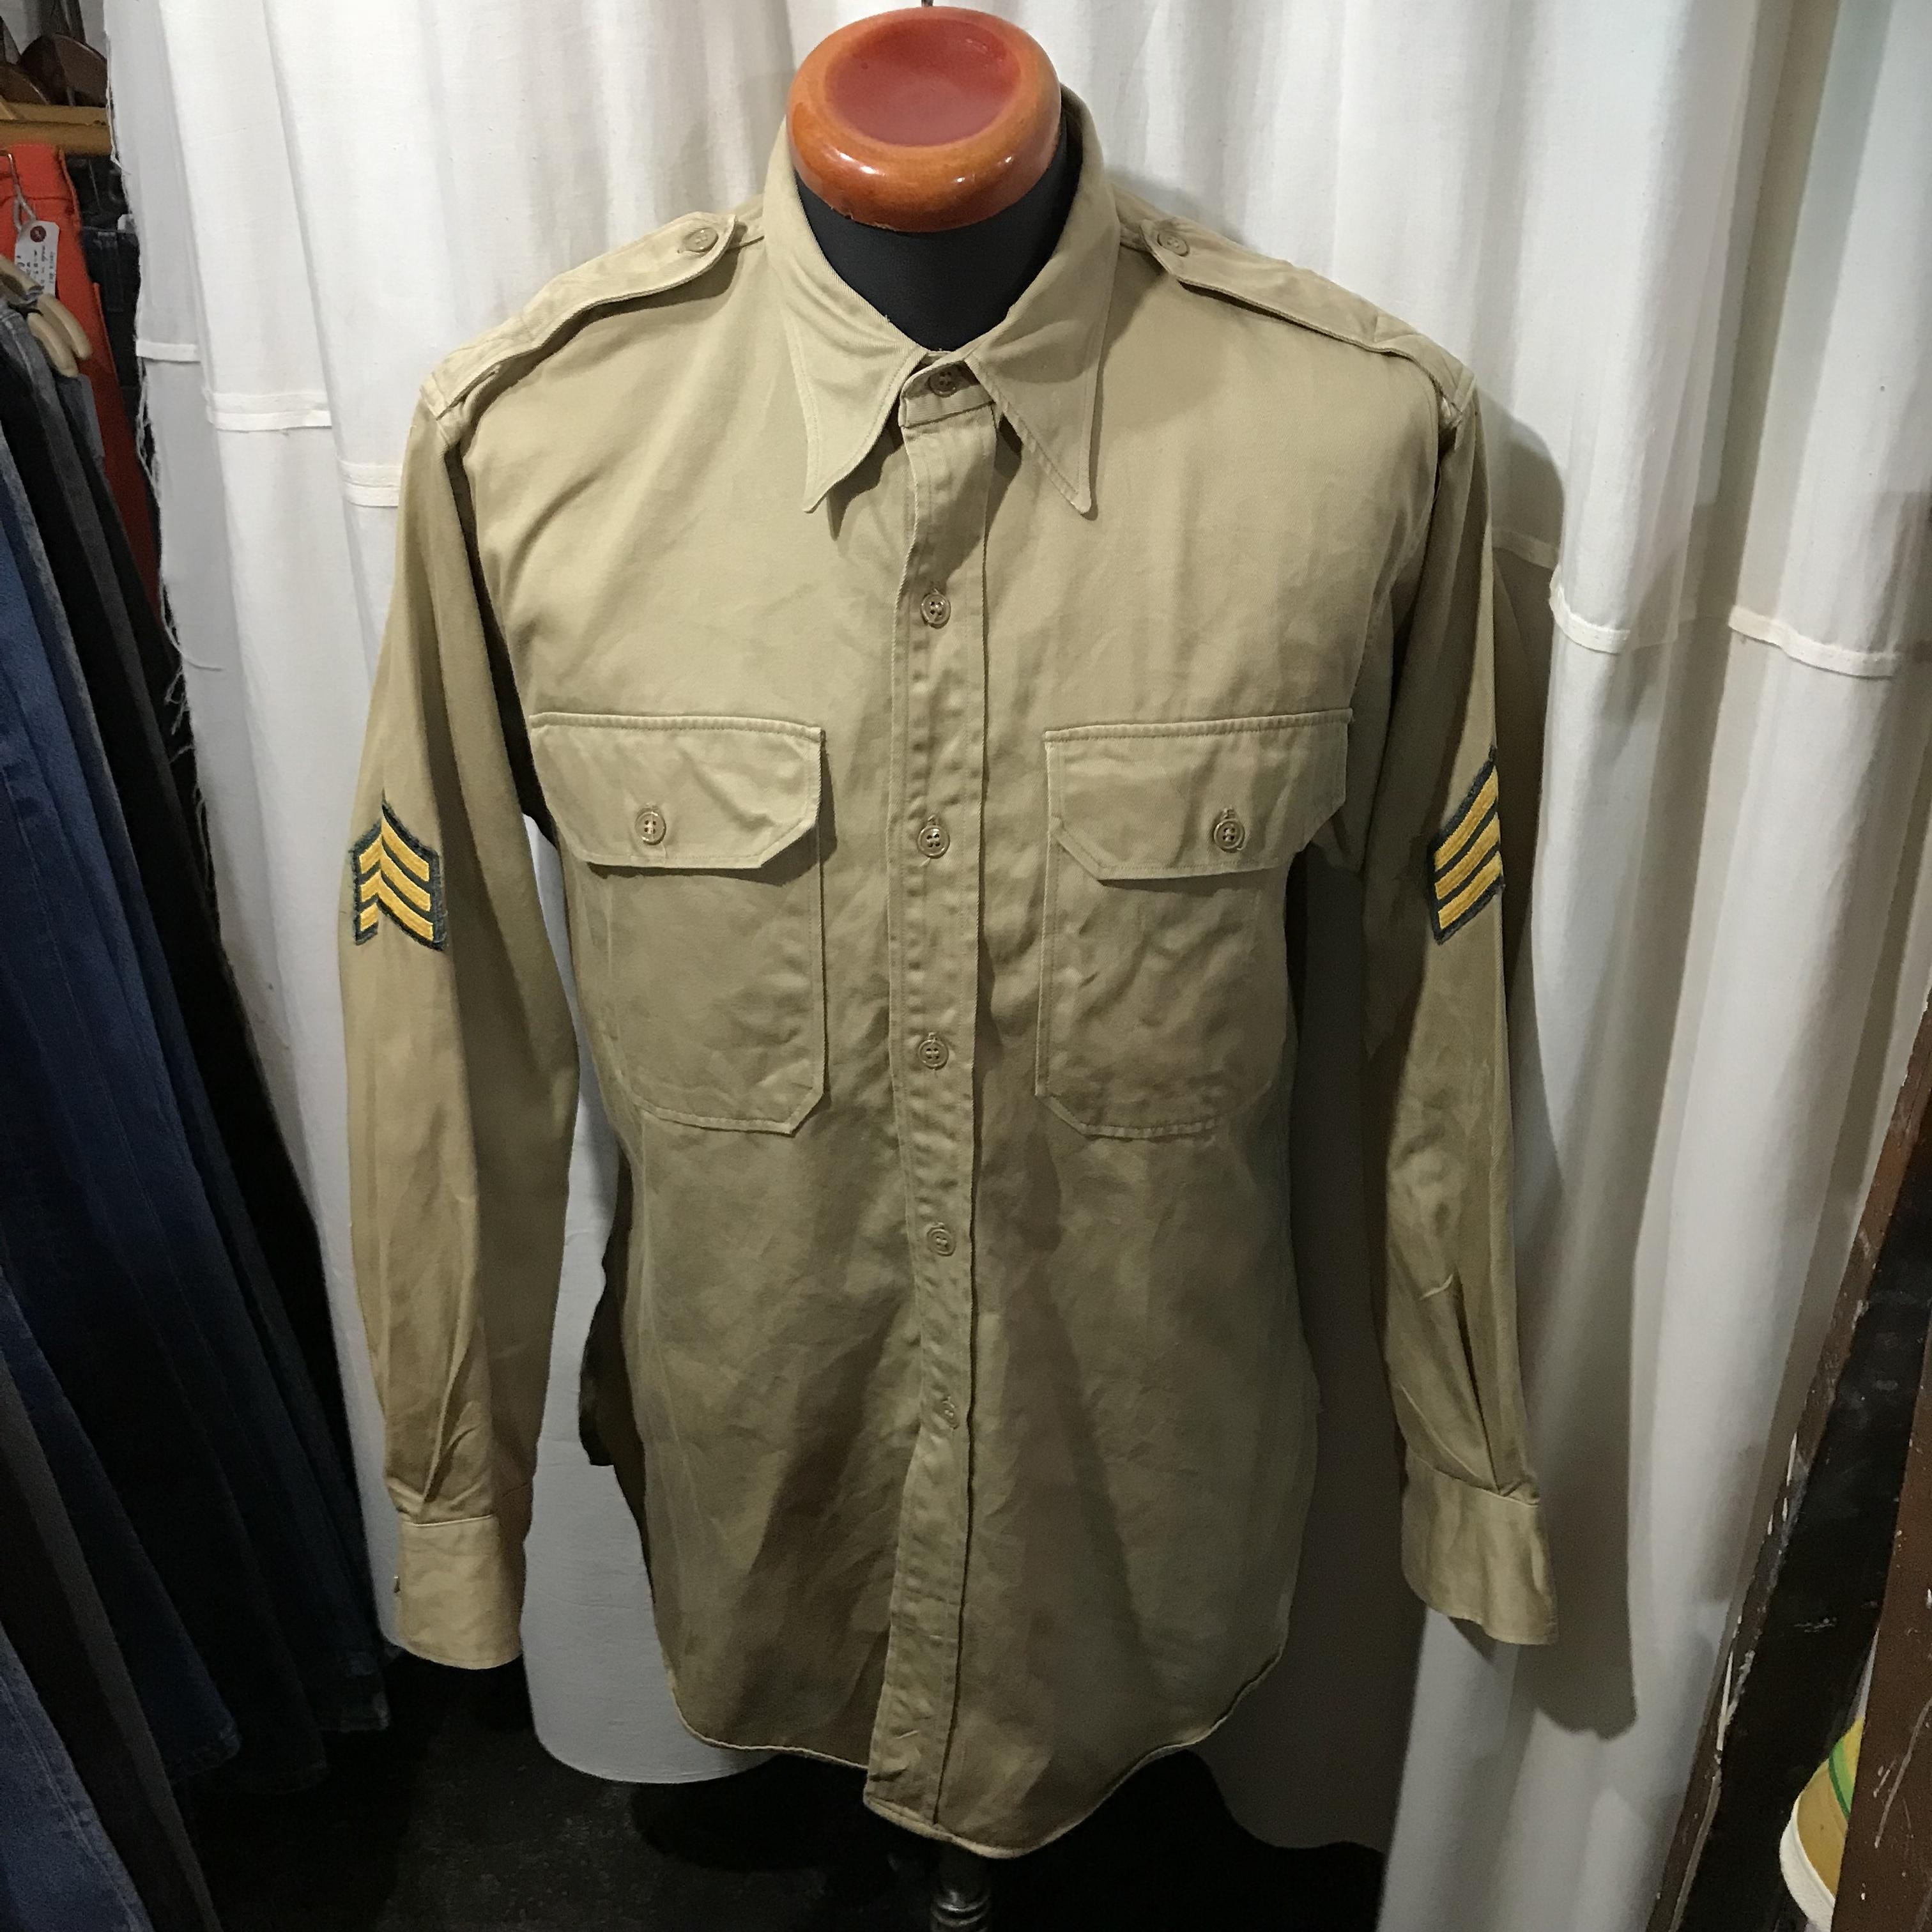 ~60's vintage USAF アメリカ空軍 マチ付きシャツ メンズXL